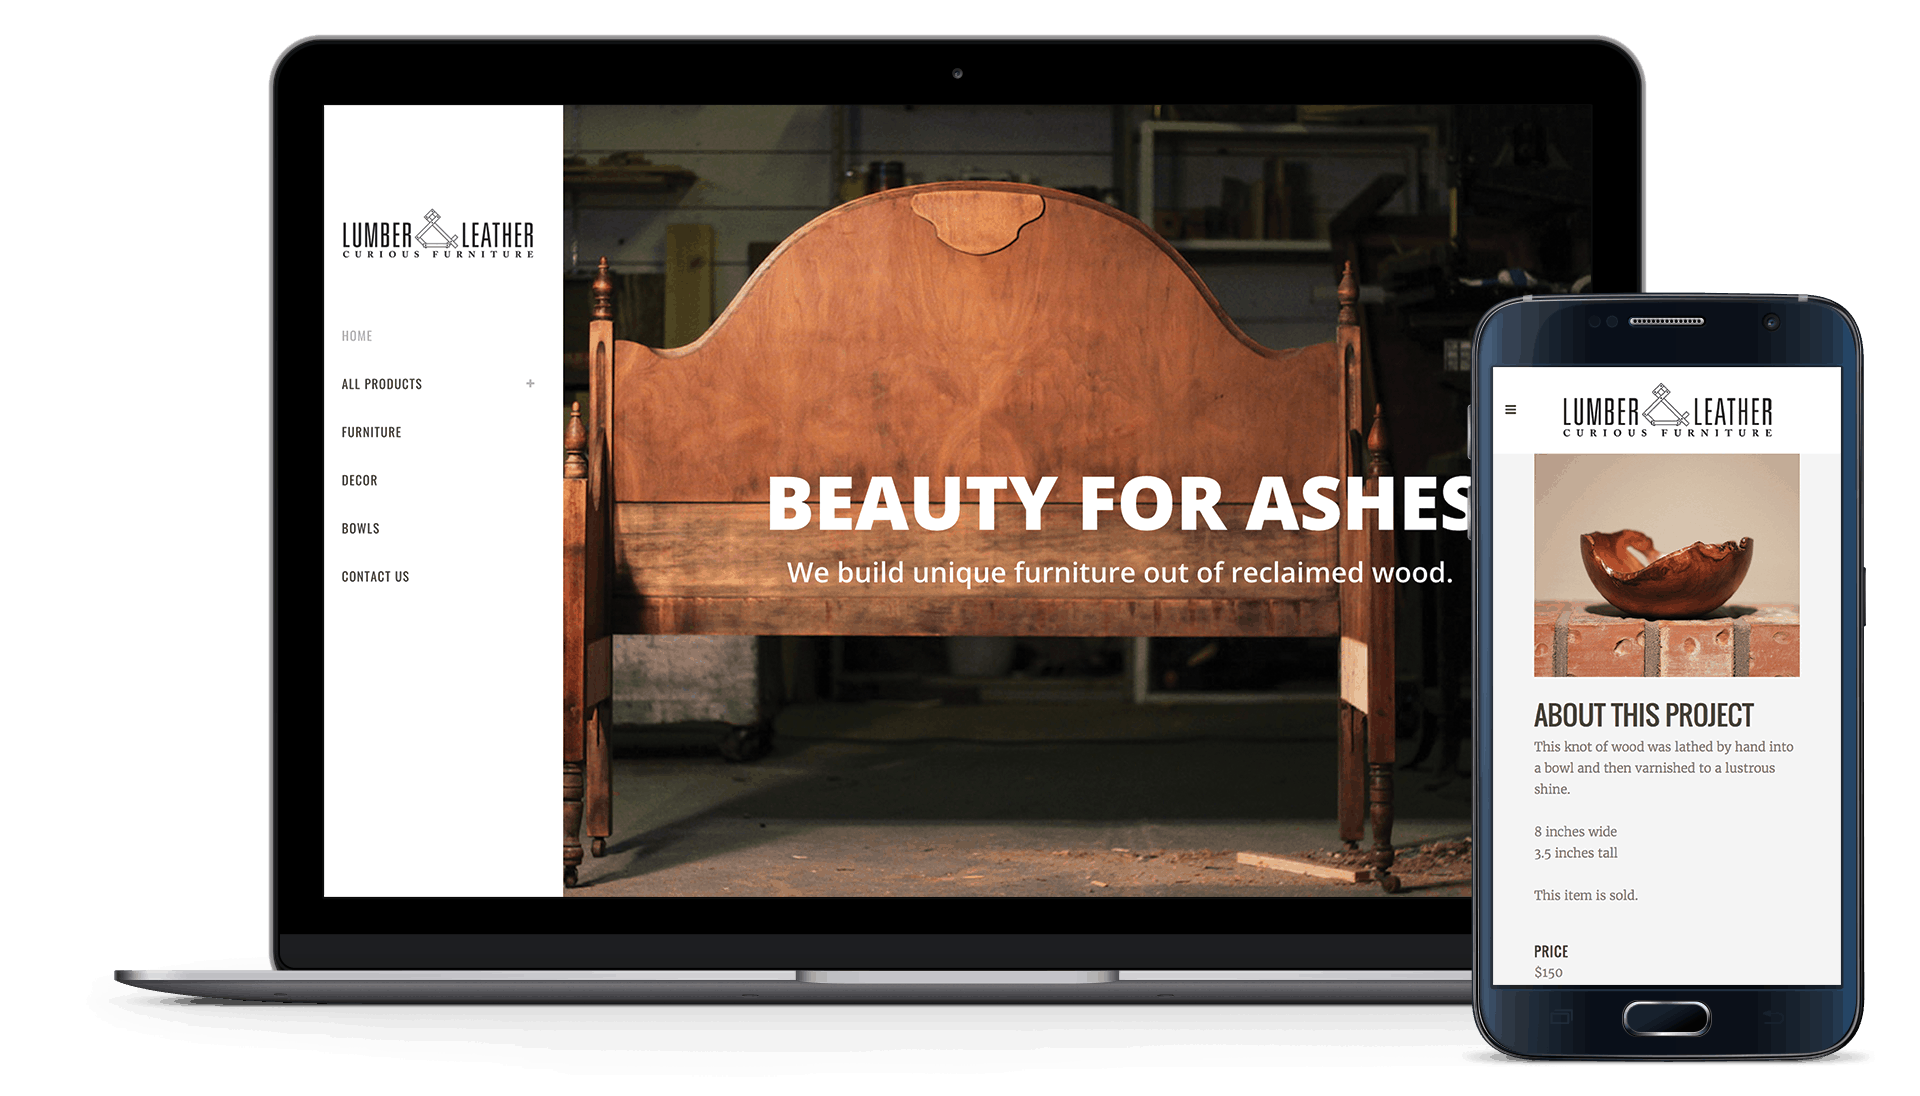 Lumber-&-Leather---LandL---Website